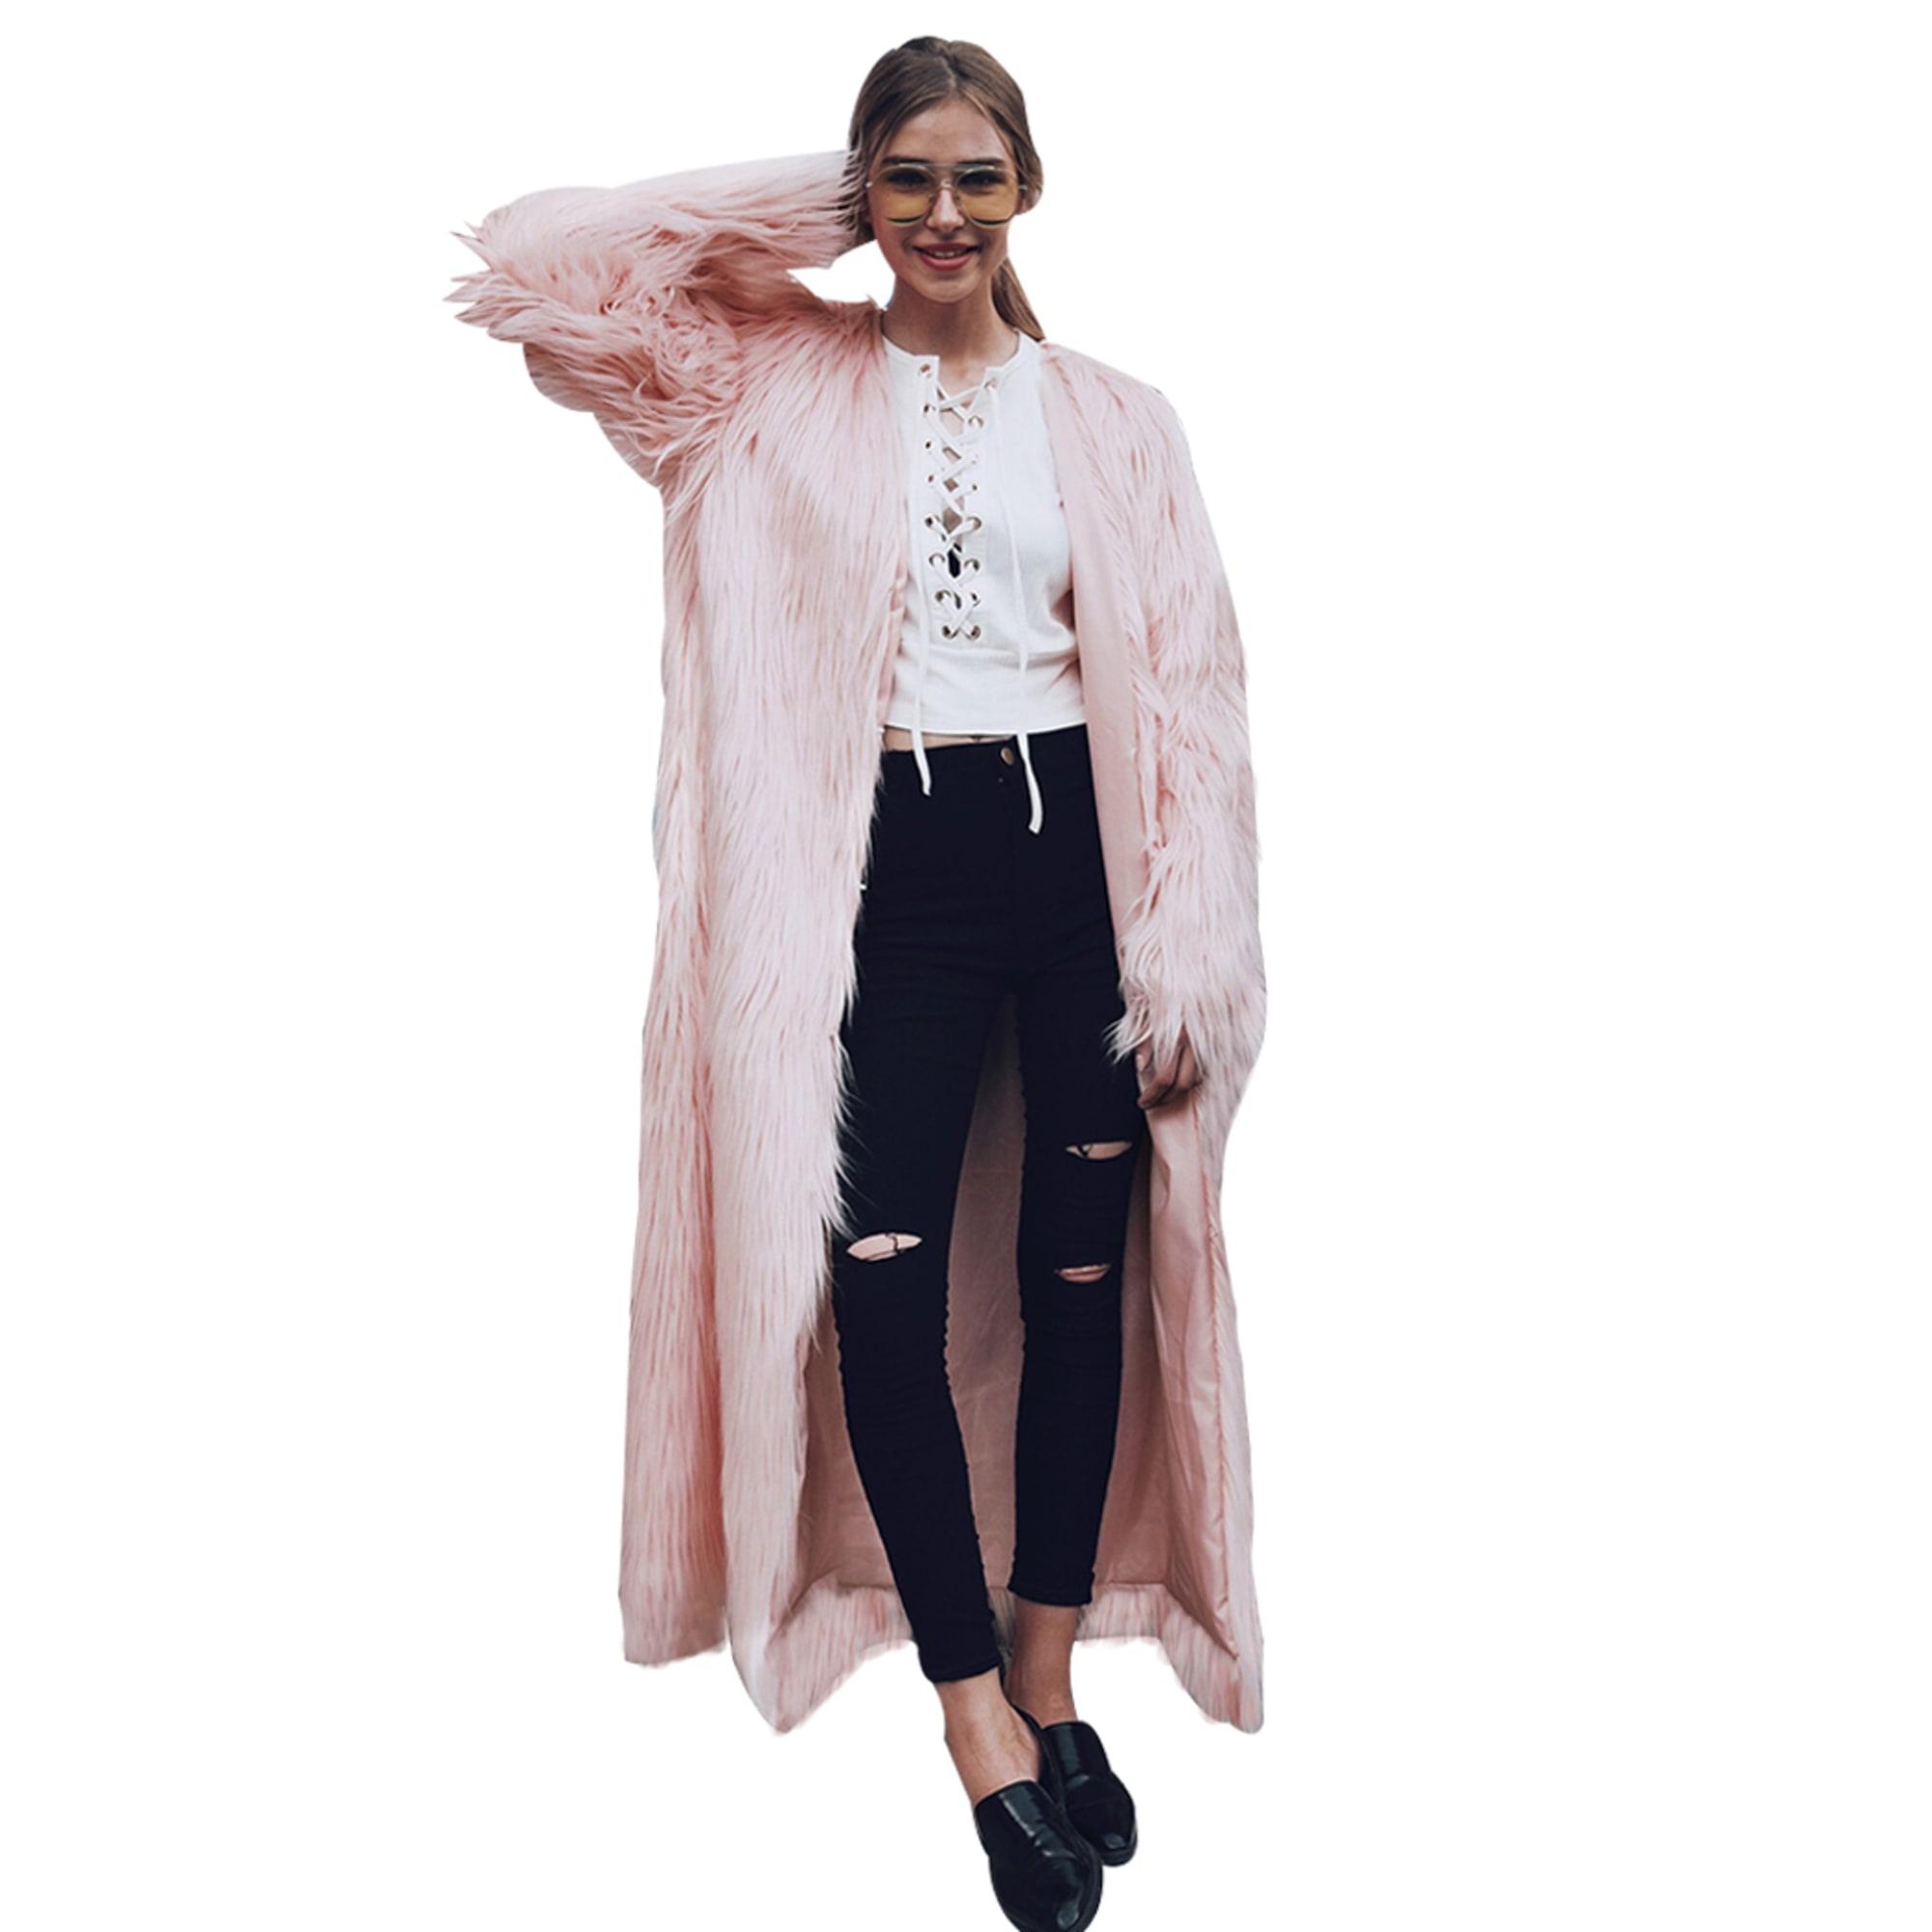 Manteau en fourrure CATCHYMARKET Rose, fuschia, vieux rose